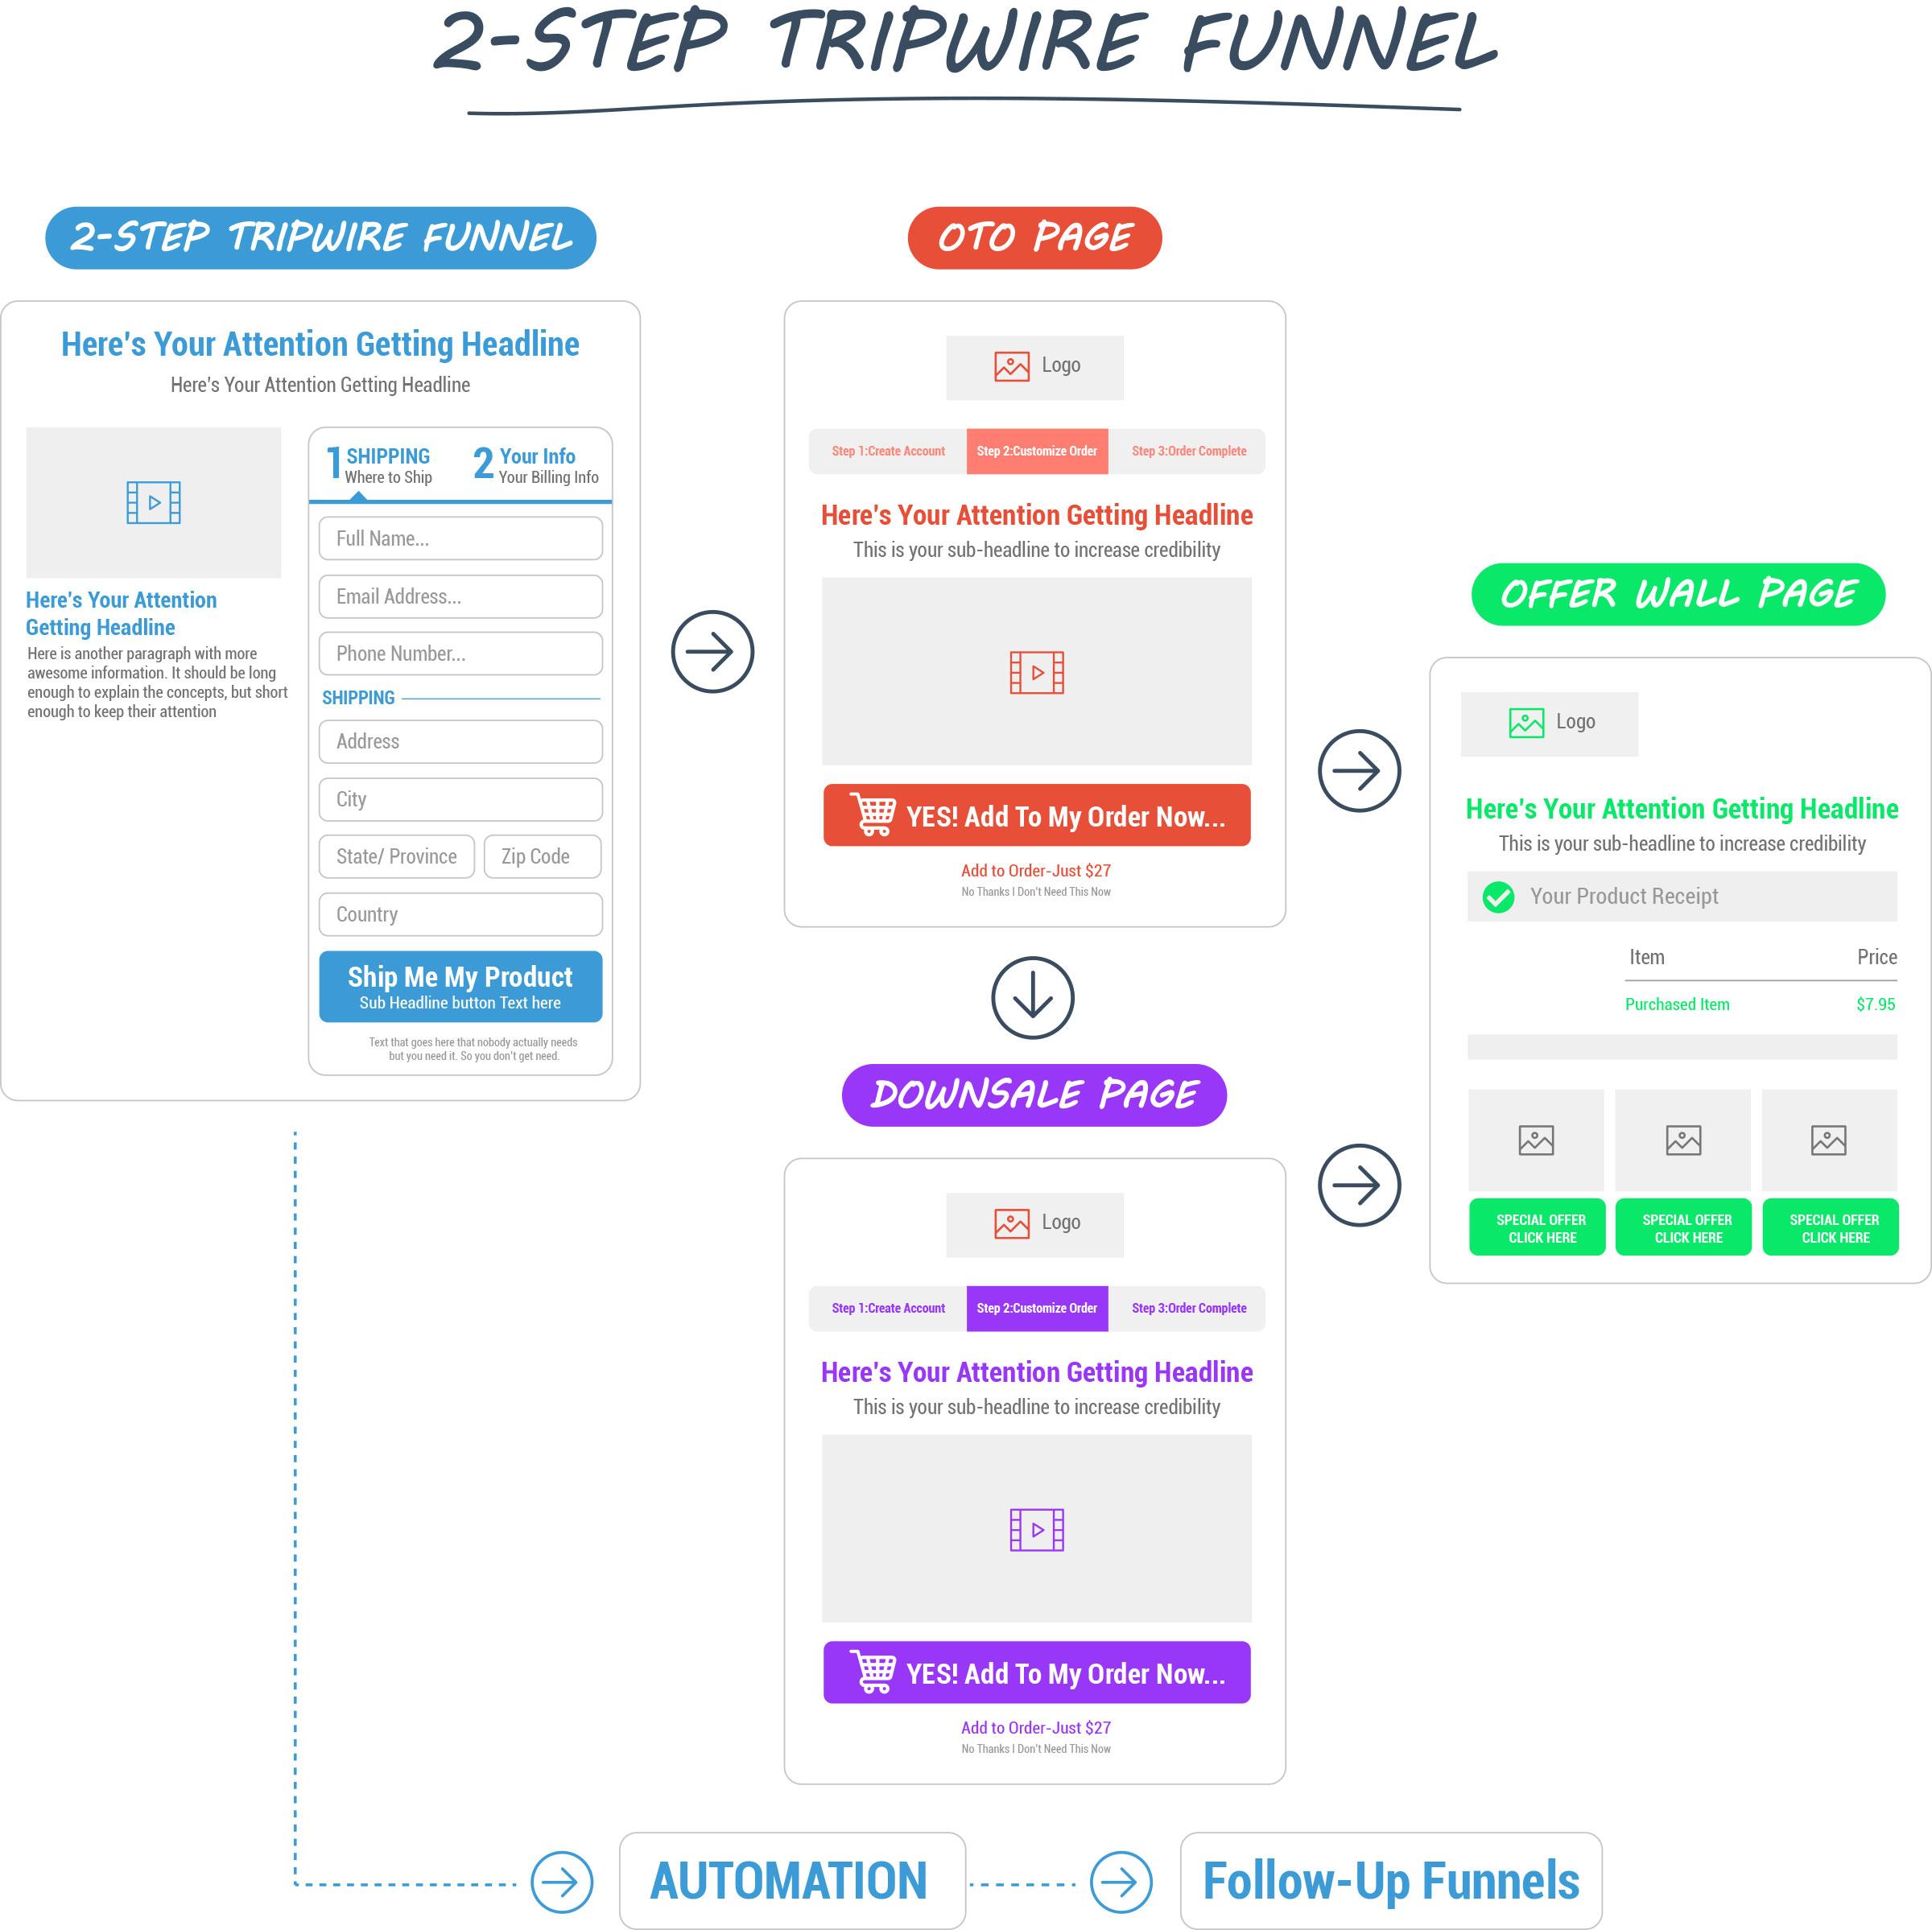 2-Step Tripwire Funnel | ClickFunnels